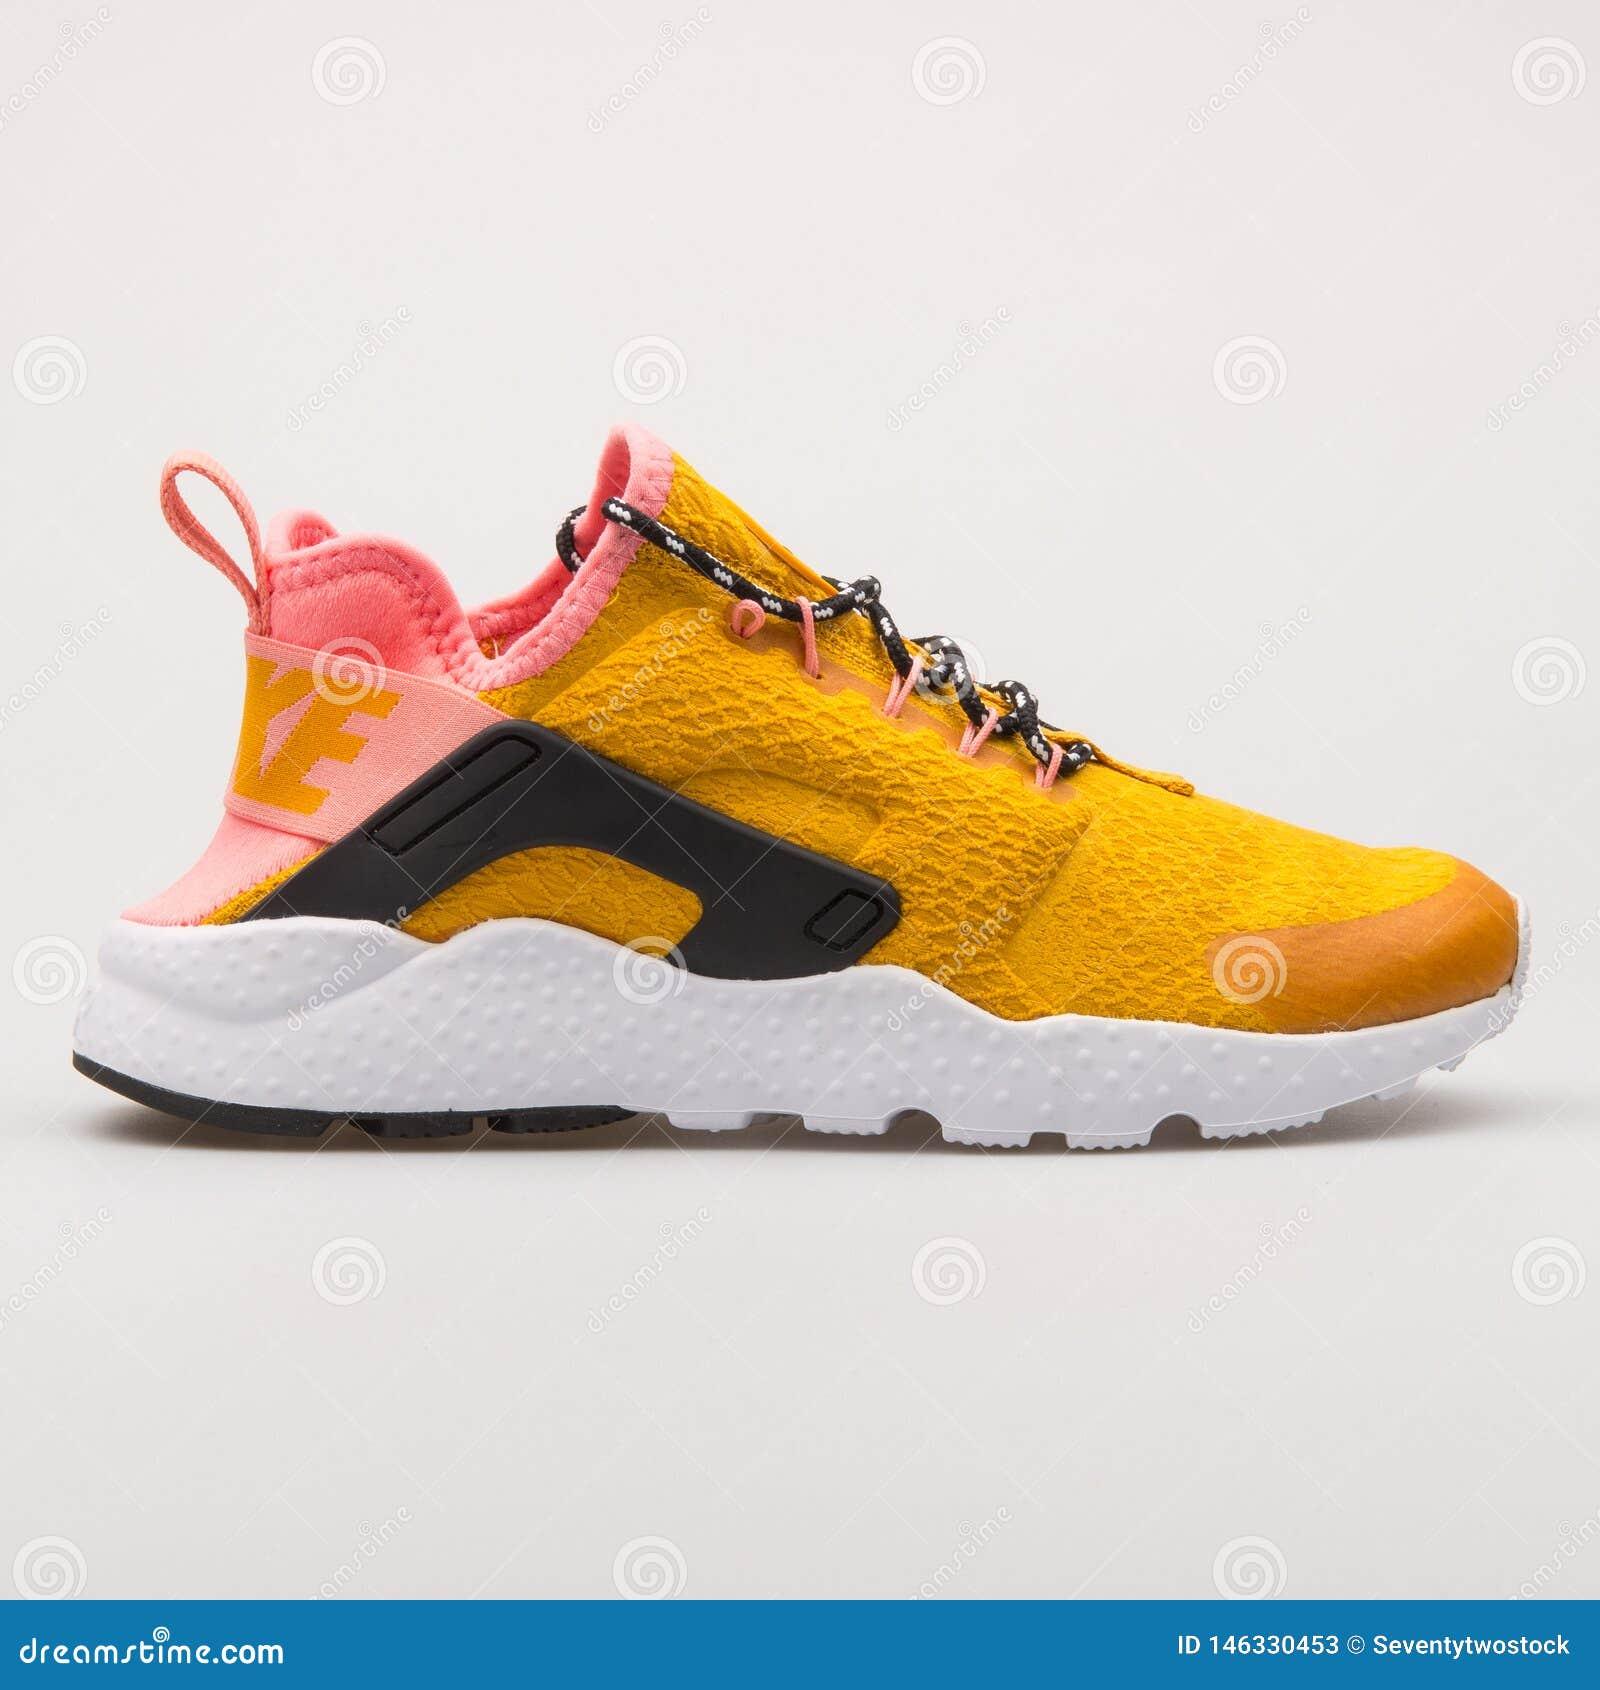 Nike Air Huarache Run Ultra SE Gold And Pink Sneaker Editorial ...